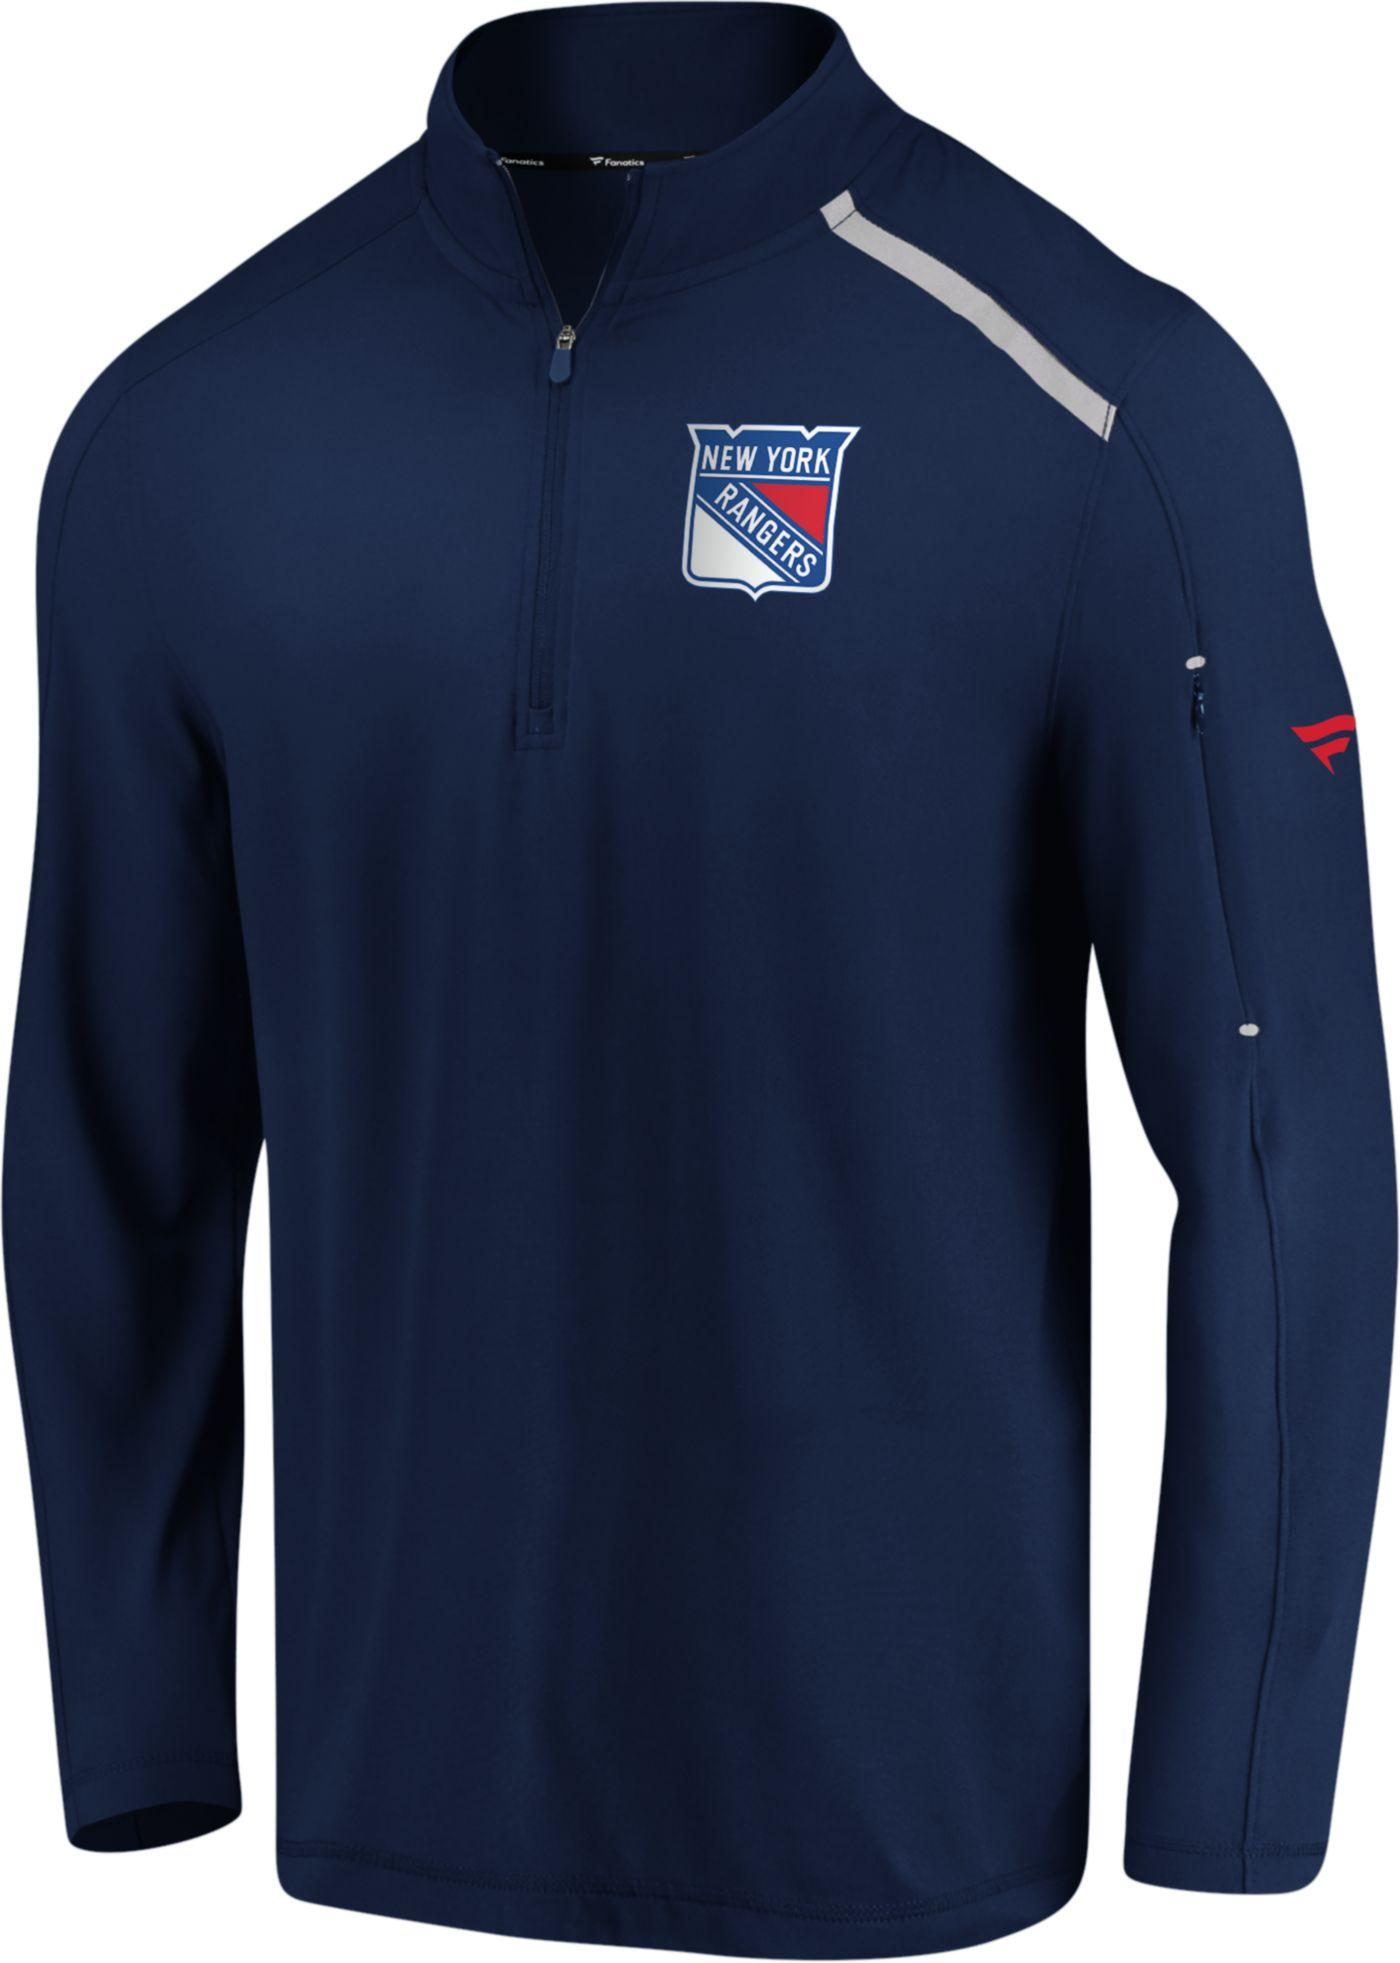 NHL Men's New York Rangers Authentic Pro Clutch Navy Quarter-Zip Pullover